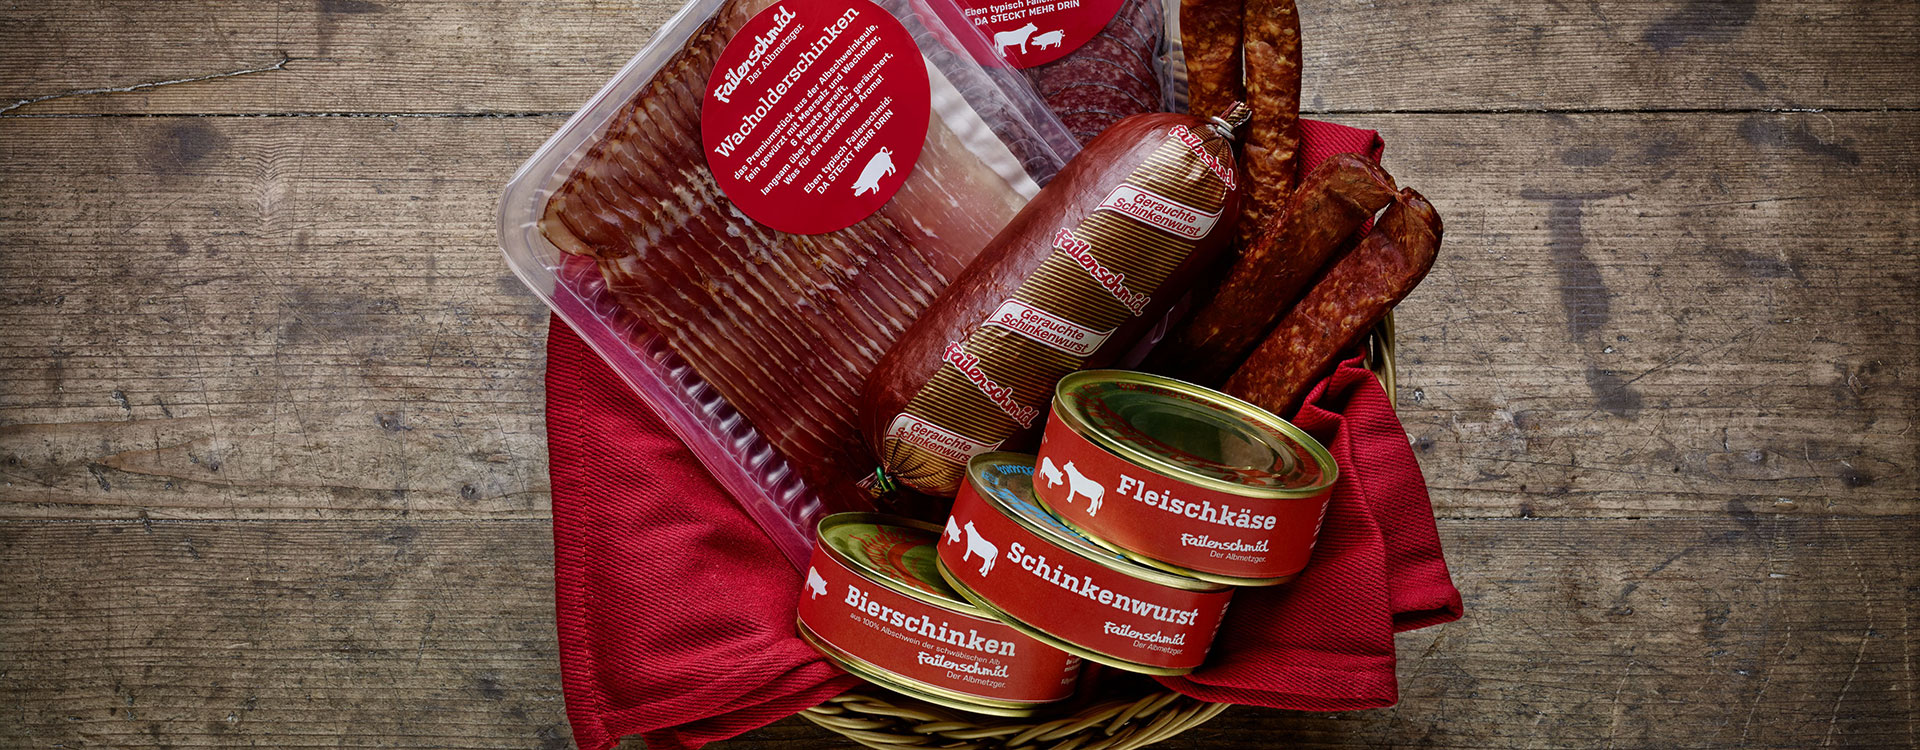 FAI_Header_Shopkategorien_probierpakete_1920x750_sosc